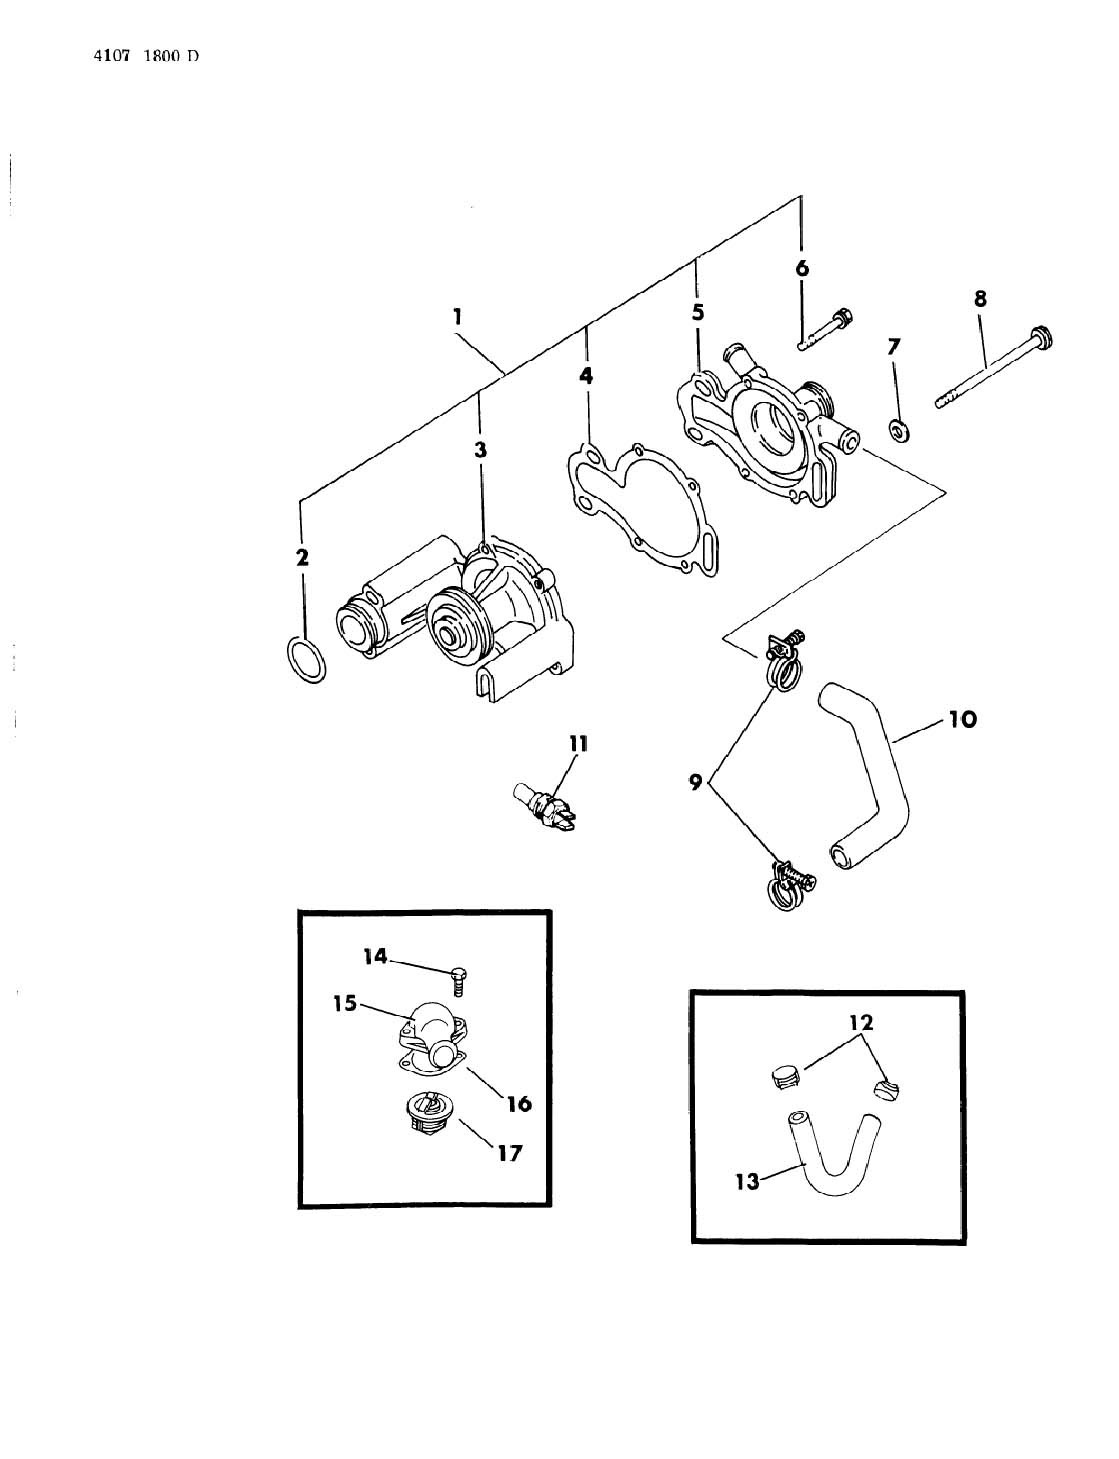 1989 chrysler new yorker wiring diagram